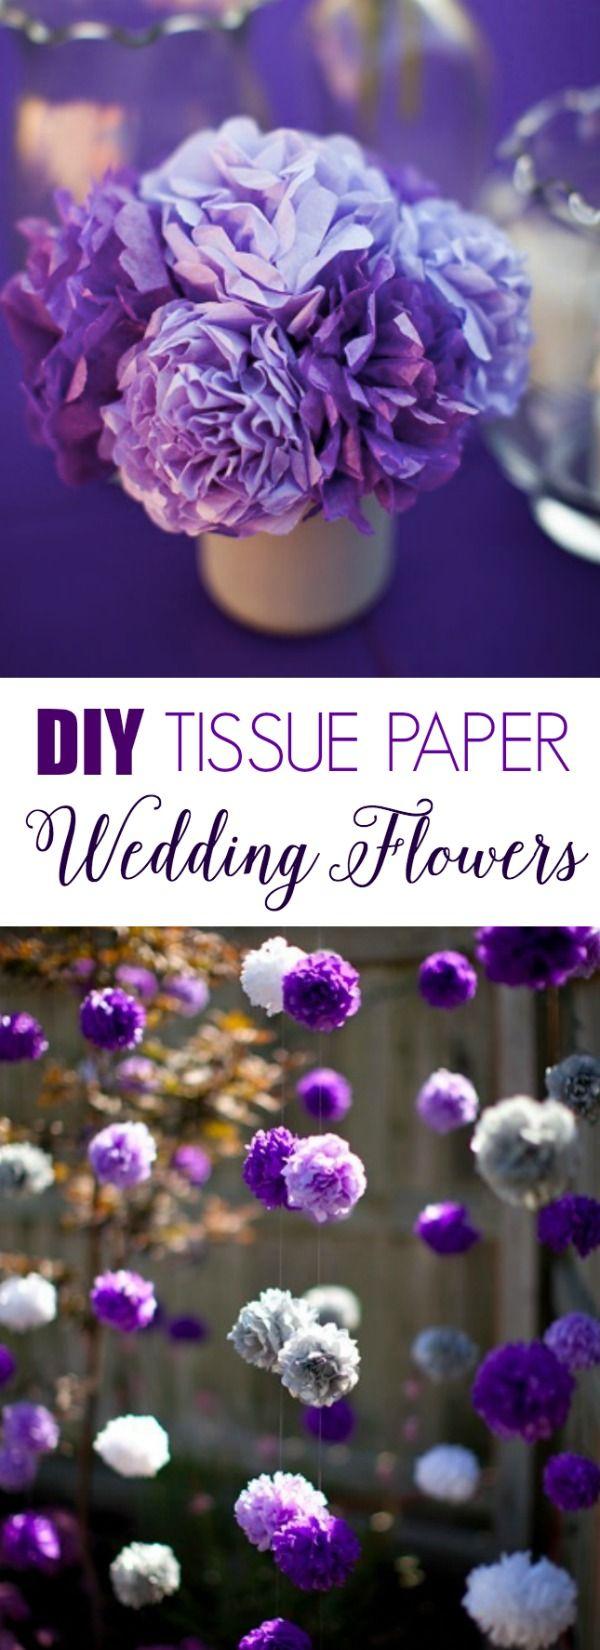 Diy tissue paper wedding flowers instructions and supplies http diy tissue paper wedding flowers instructions and supplies http mightylinksfo Choice Image